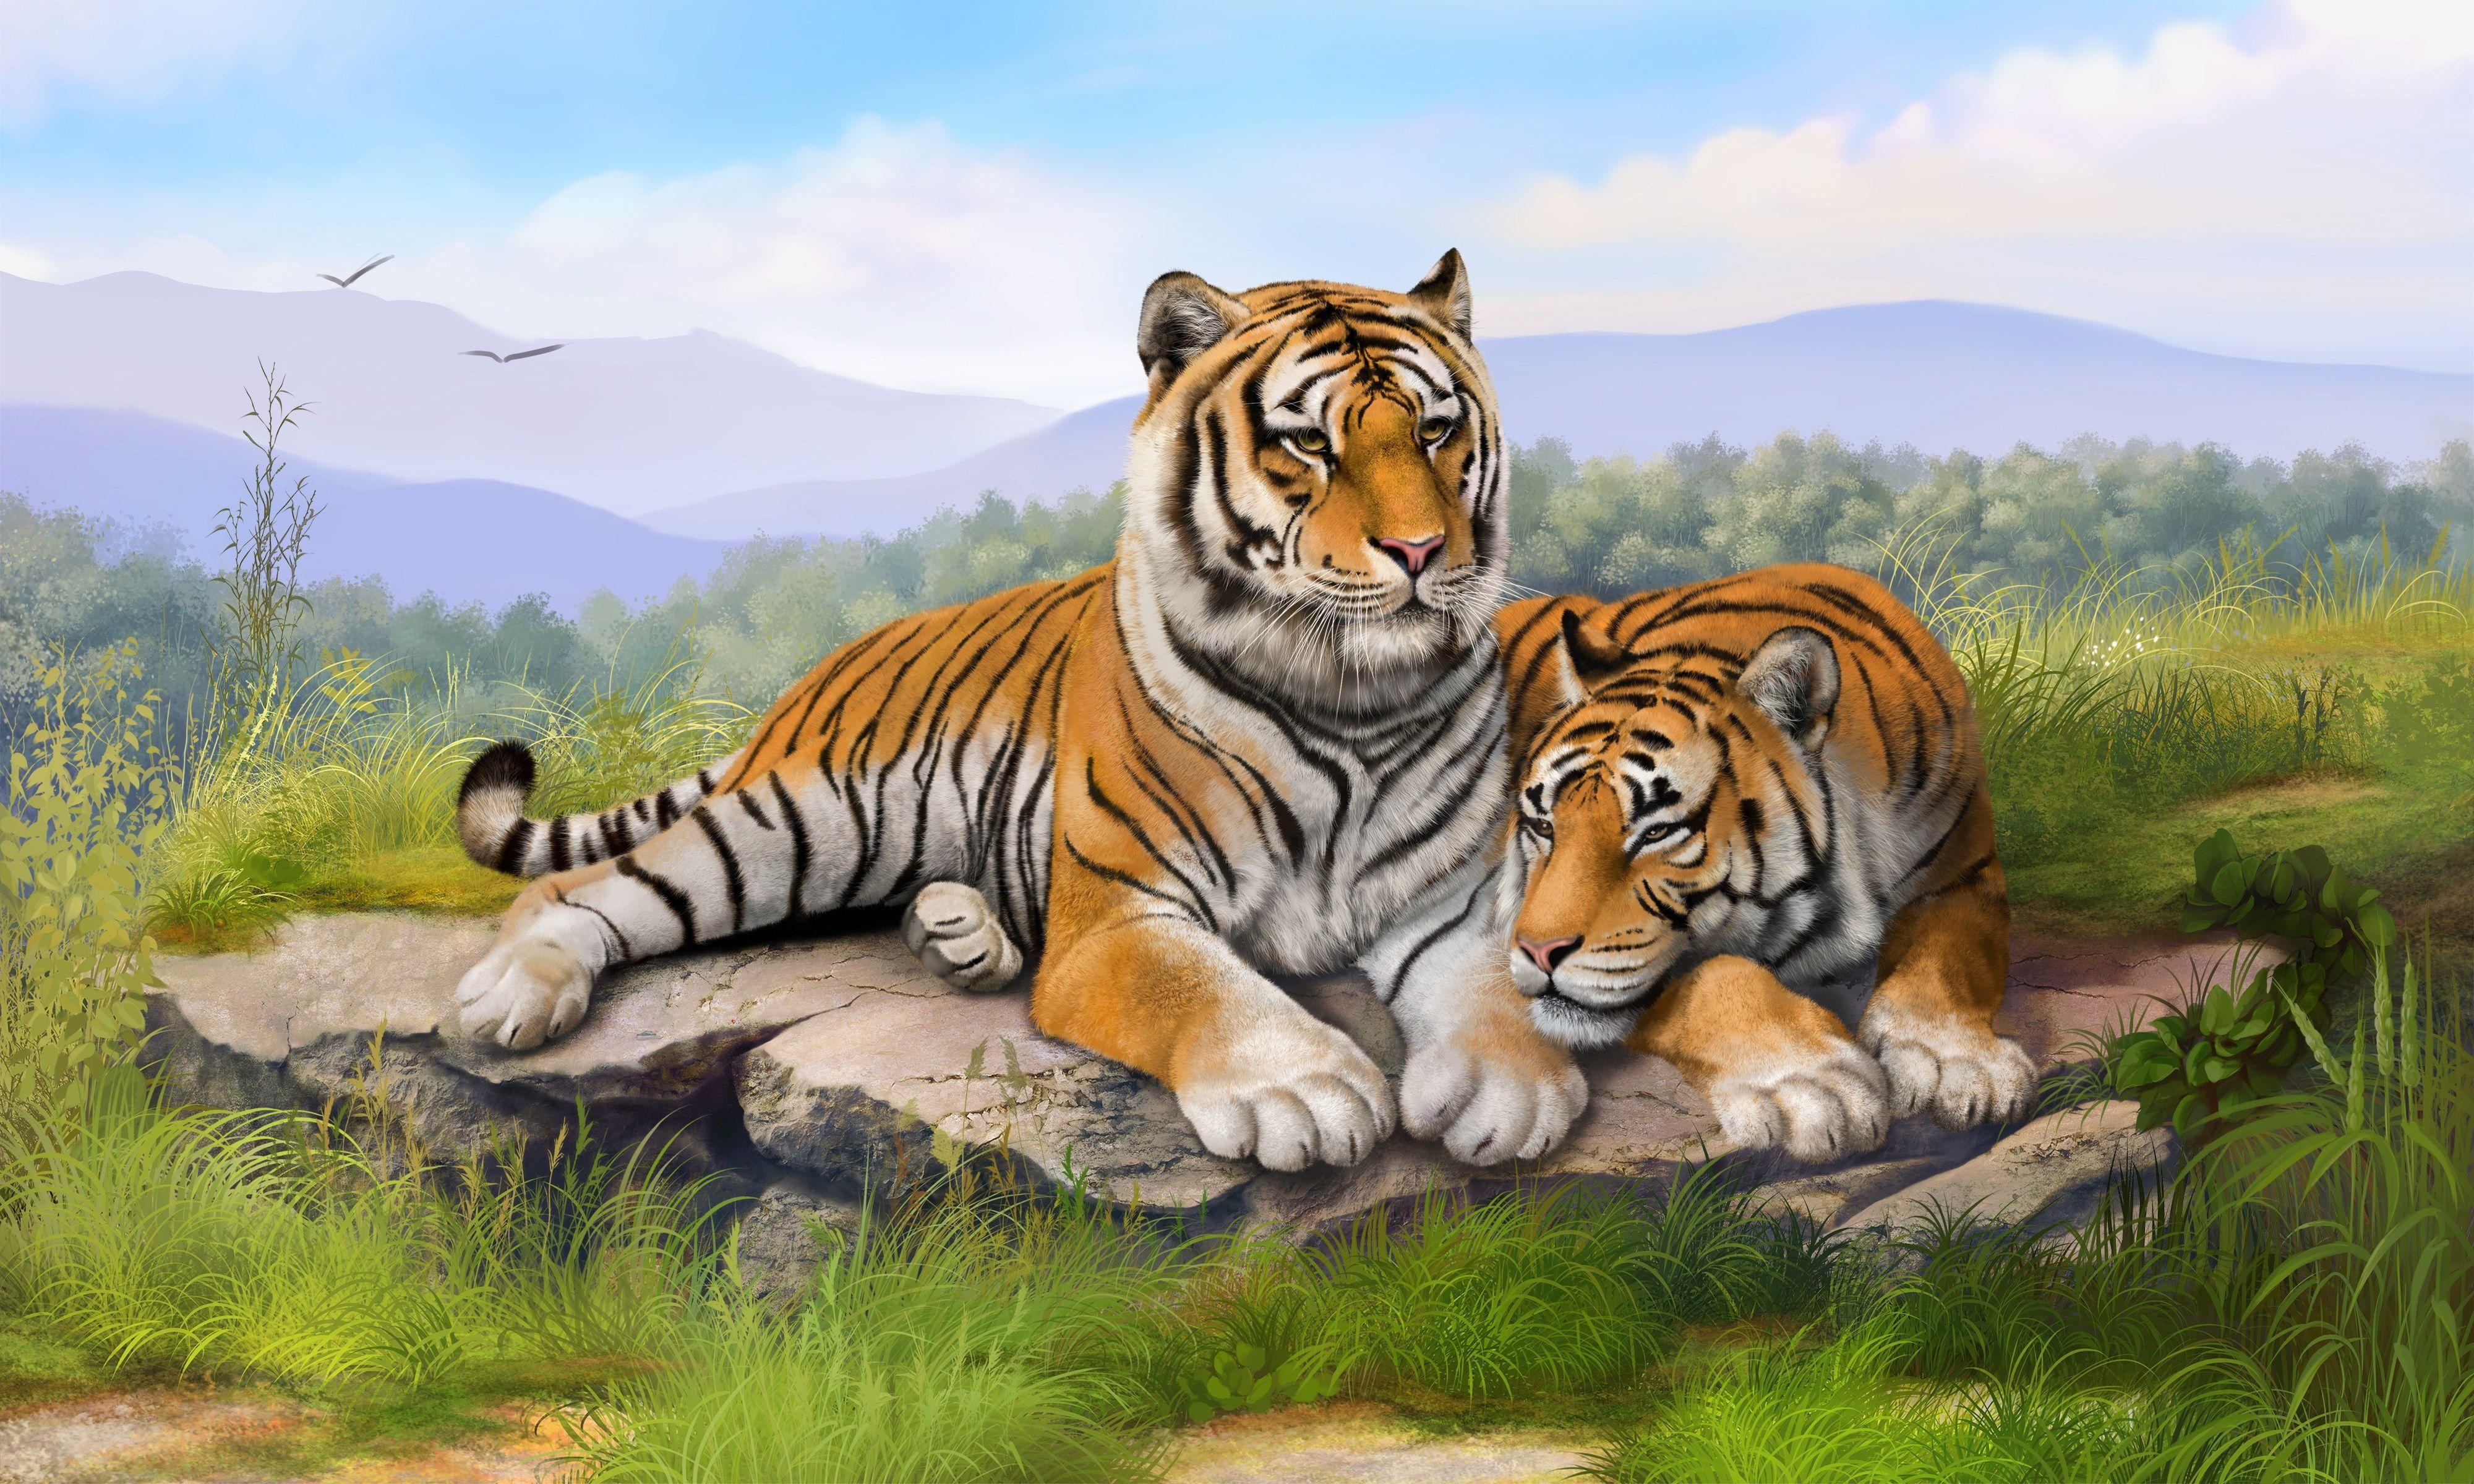 tiger wallpaper high resolution | simplexpict1st